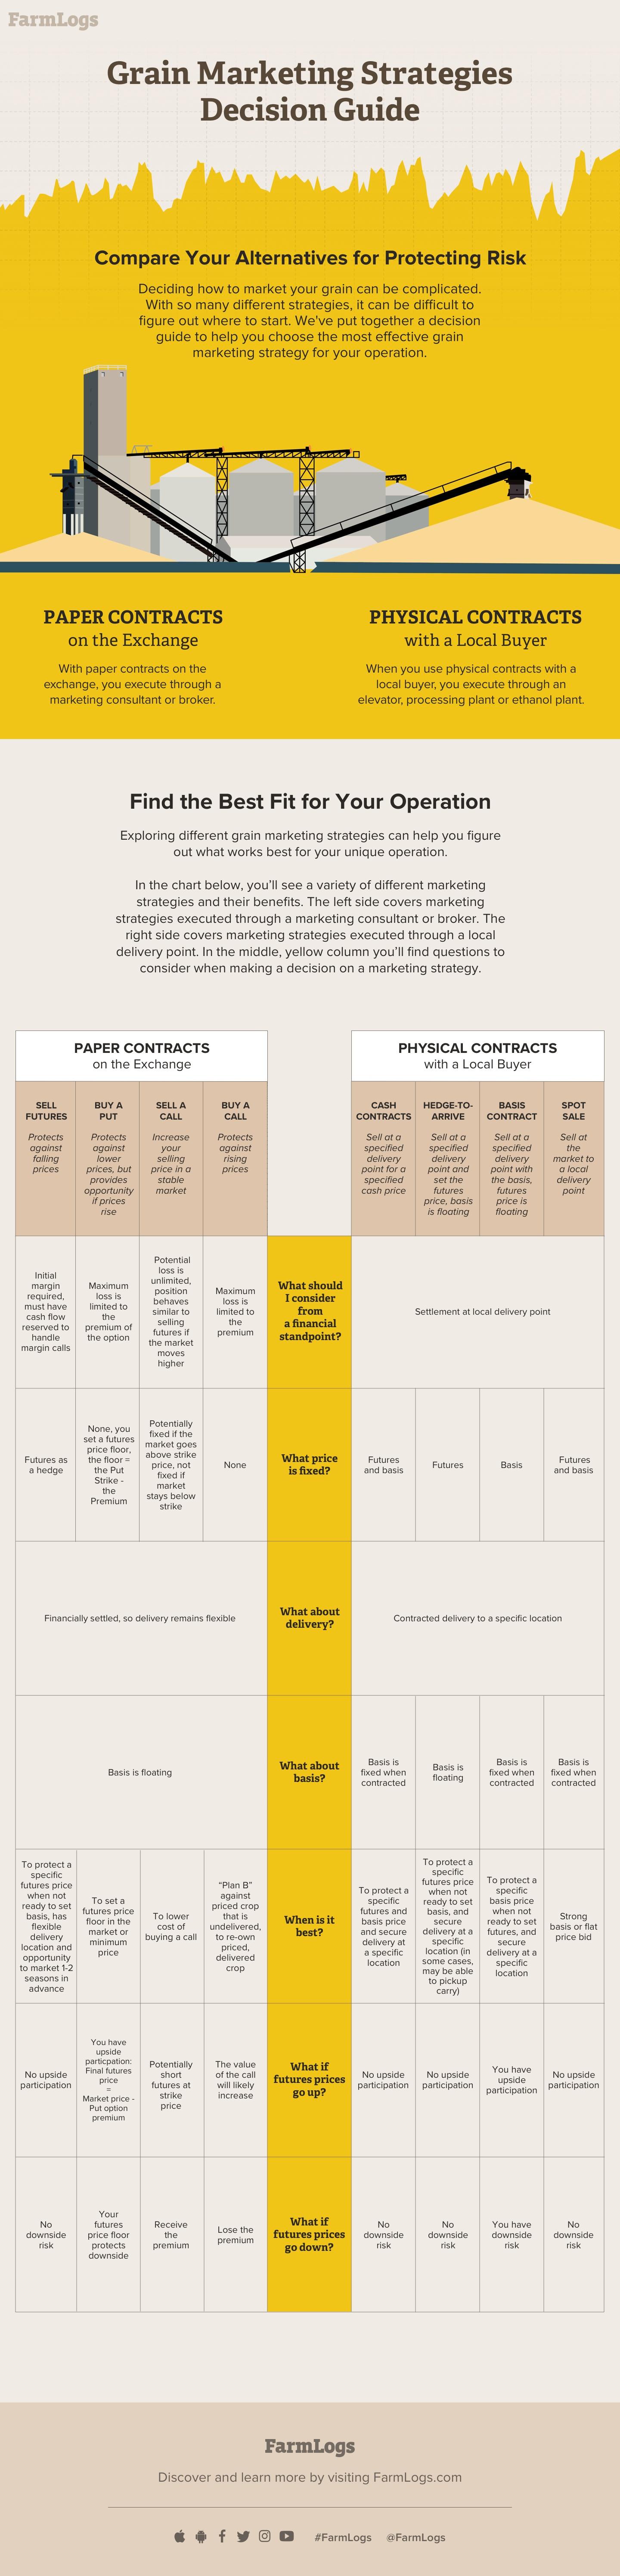 pros-cons-grain-marketing-strategies-FINAL.jpg